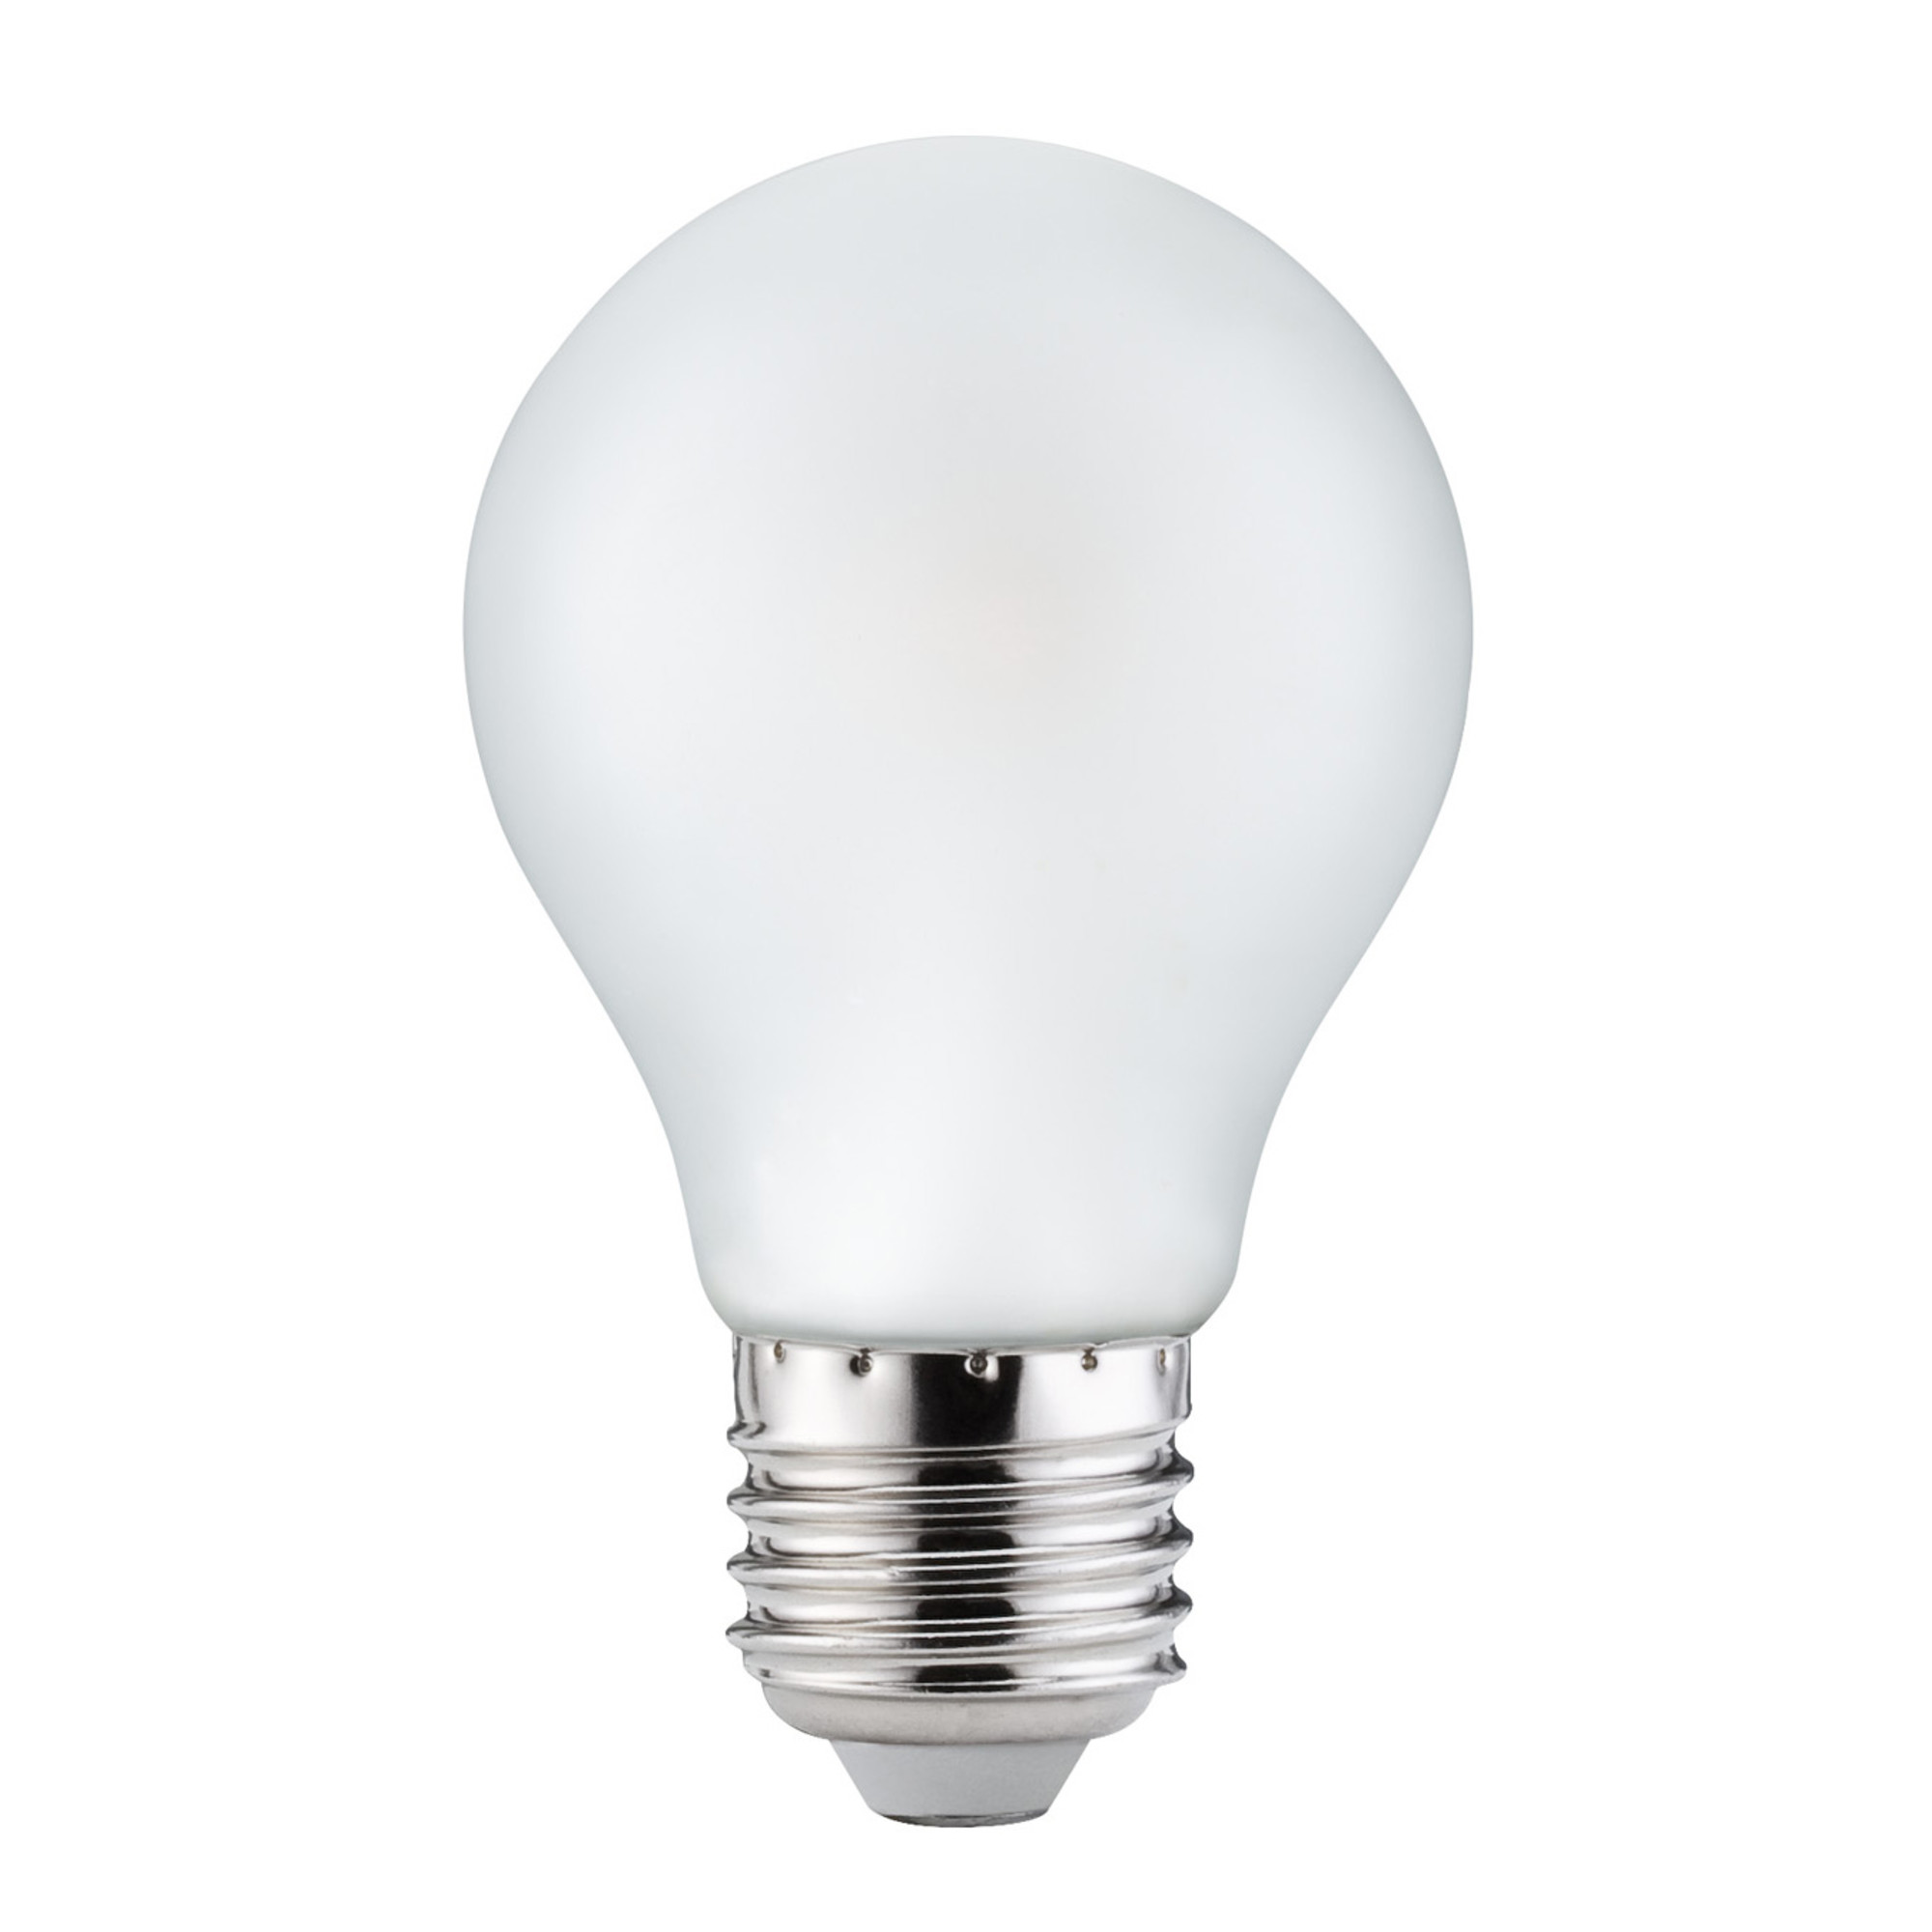 Лампа светодиодная Paulmann 28271 E27 250 Лм теплый свет